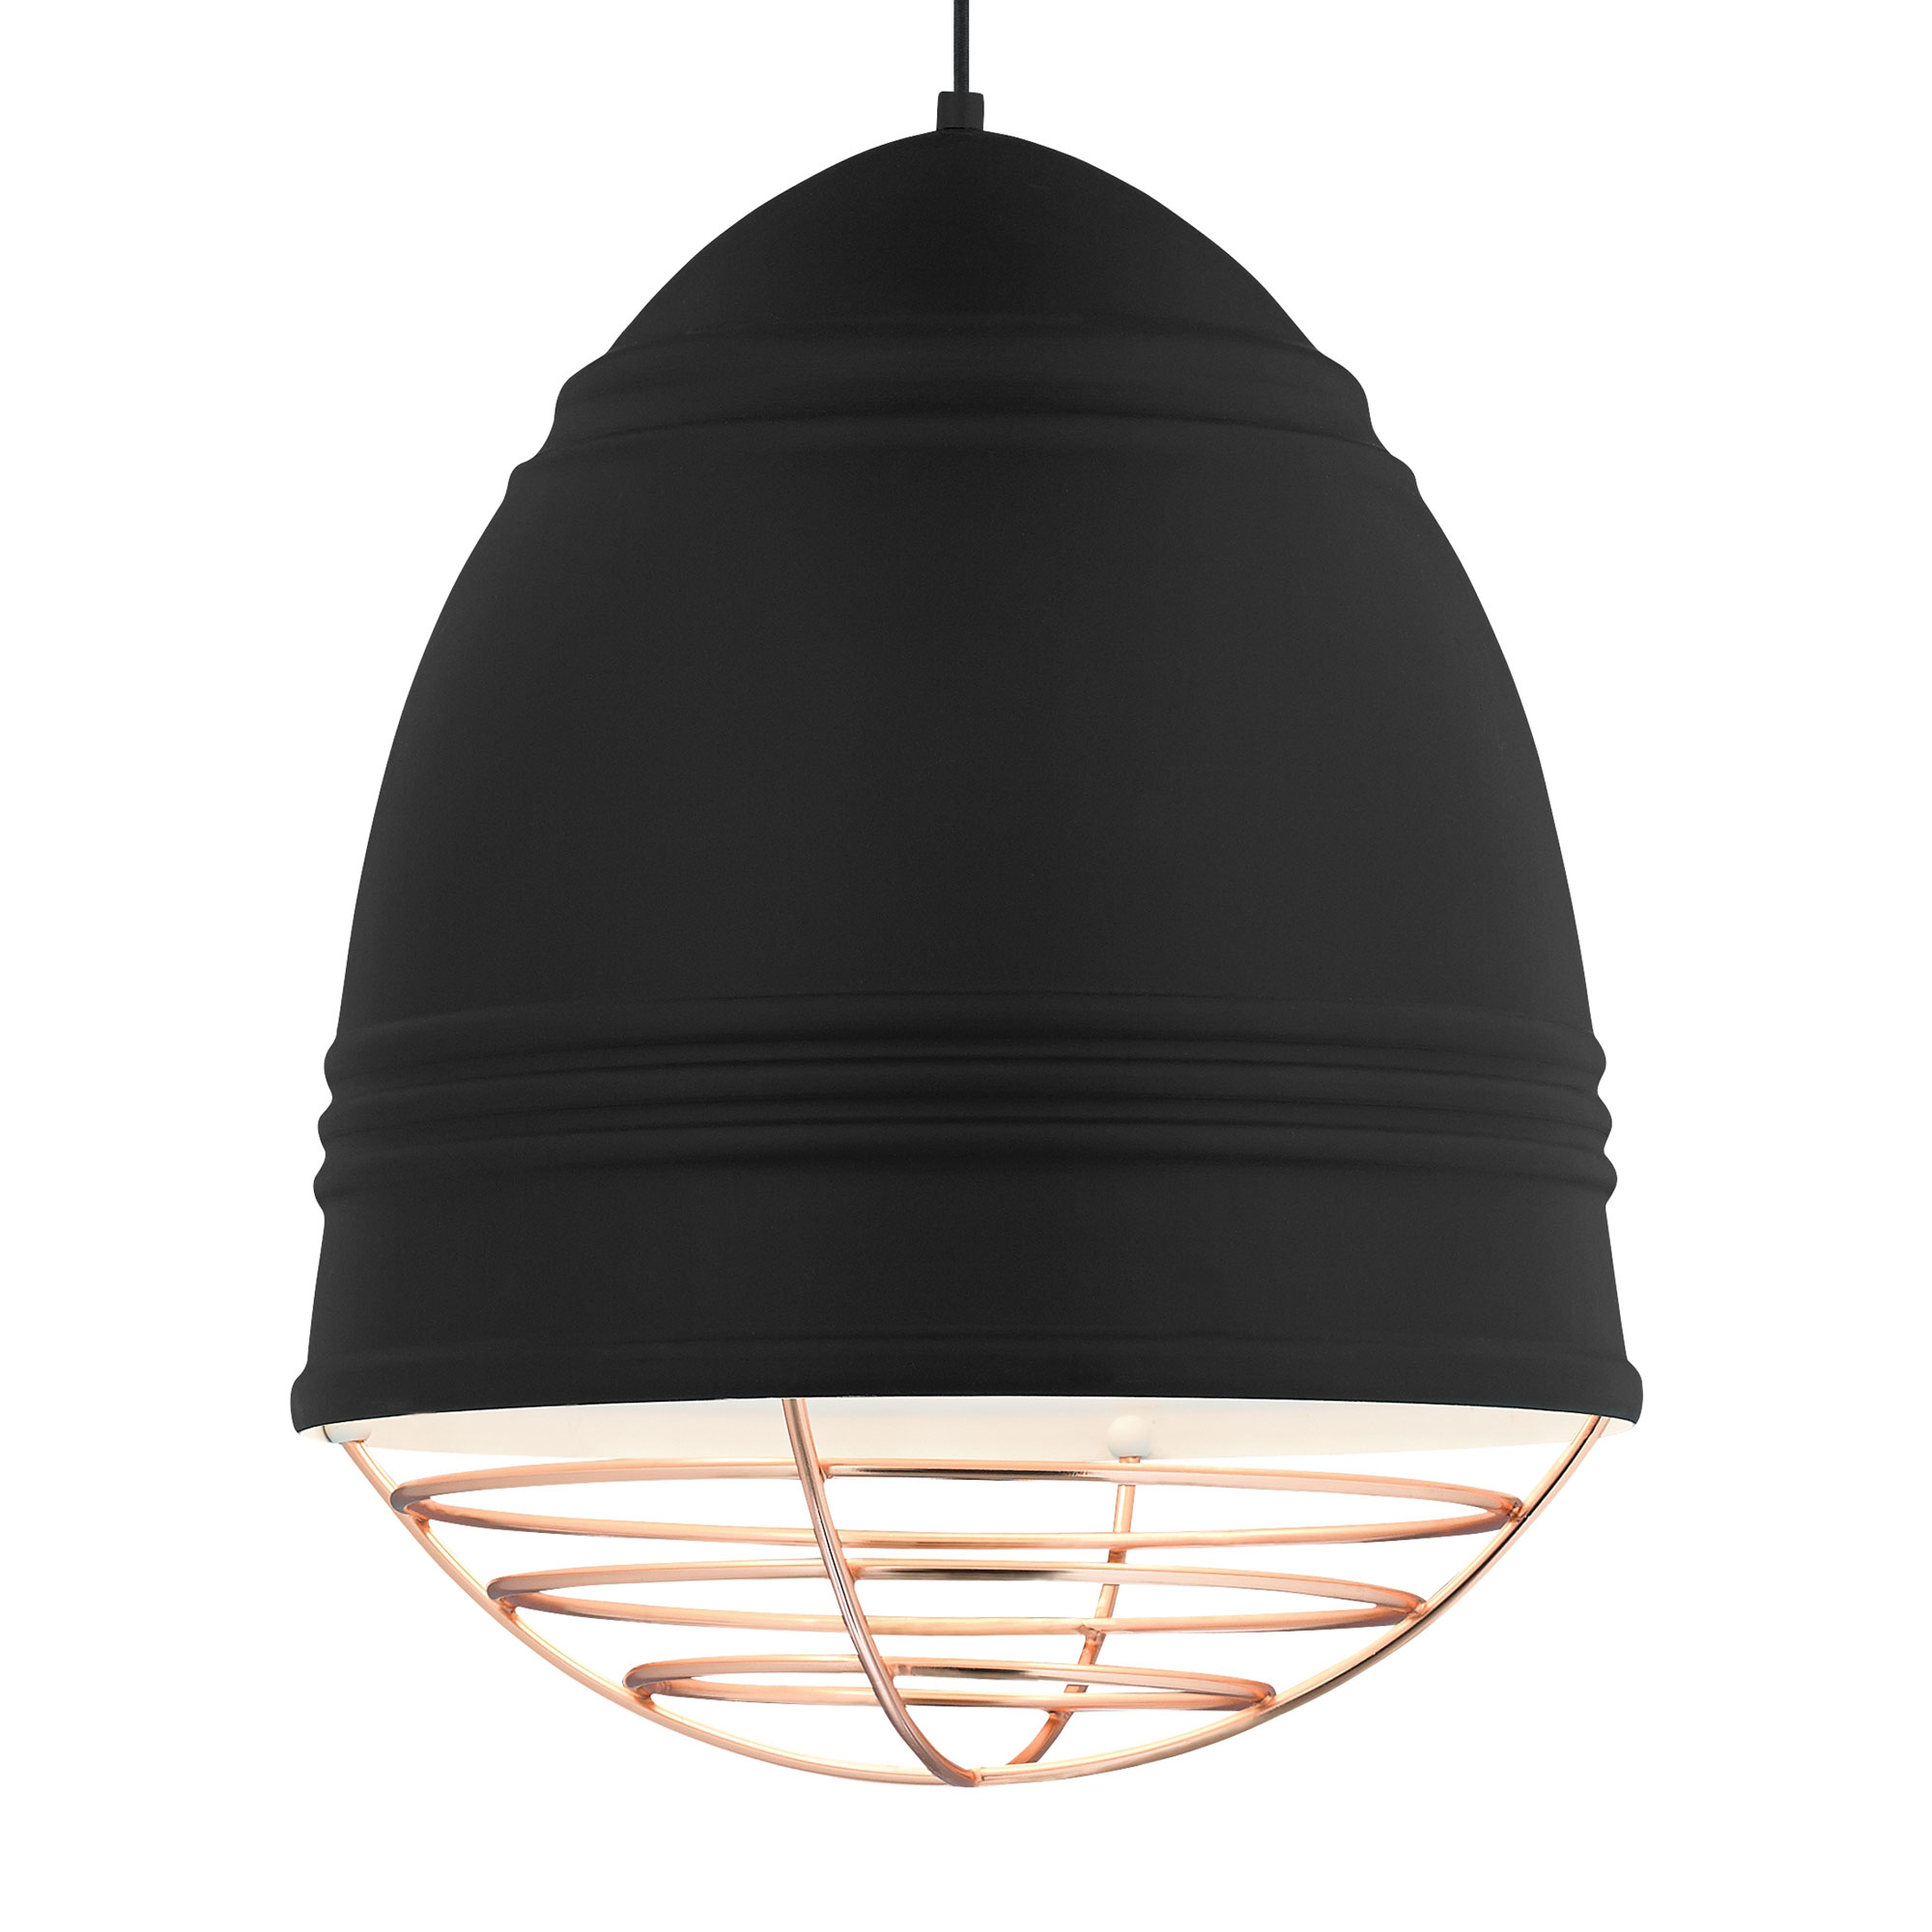 Loft Pendant By Tech Lighting 700tdlofgpbwp Led927